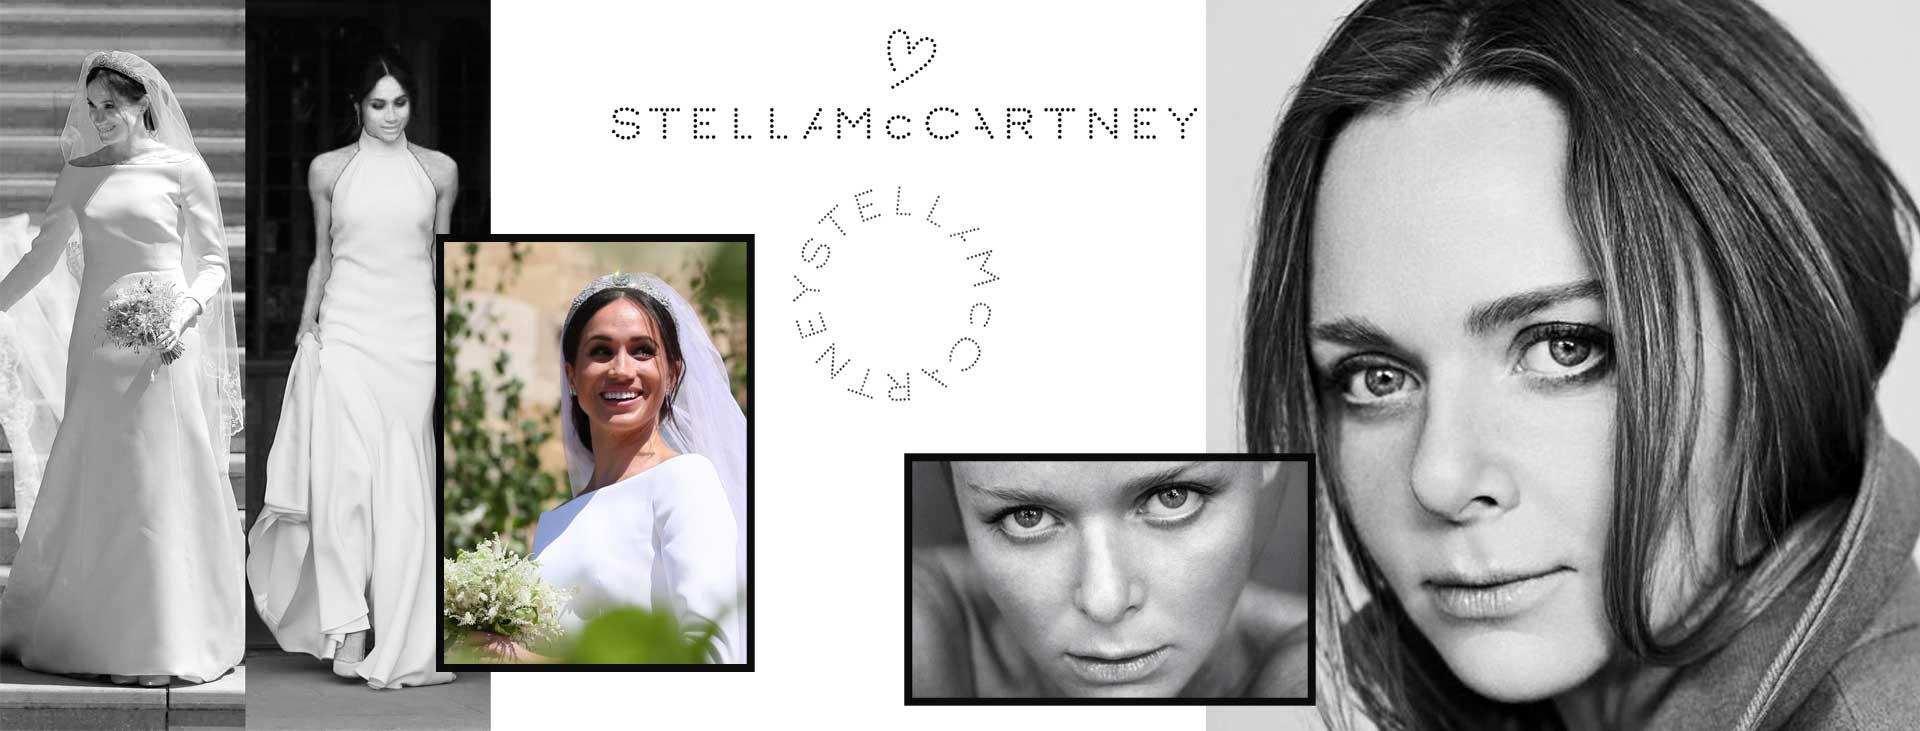 stella mccartney1 - زنان پیشگام در صنعت مد